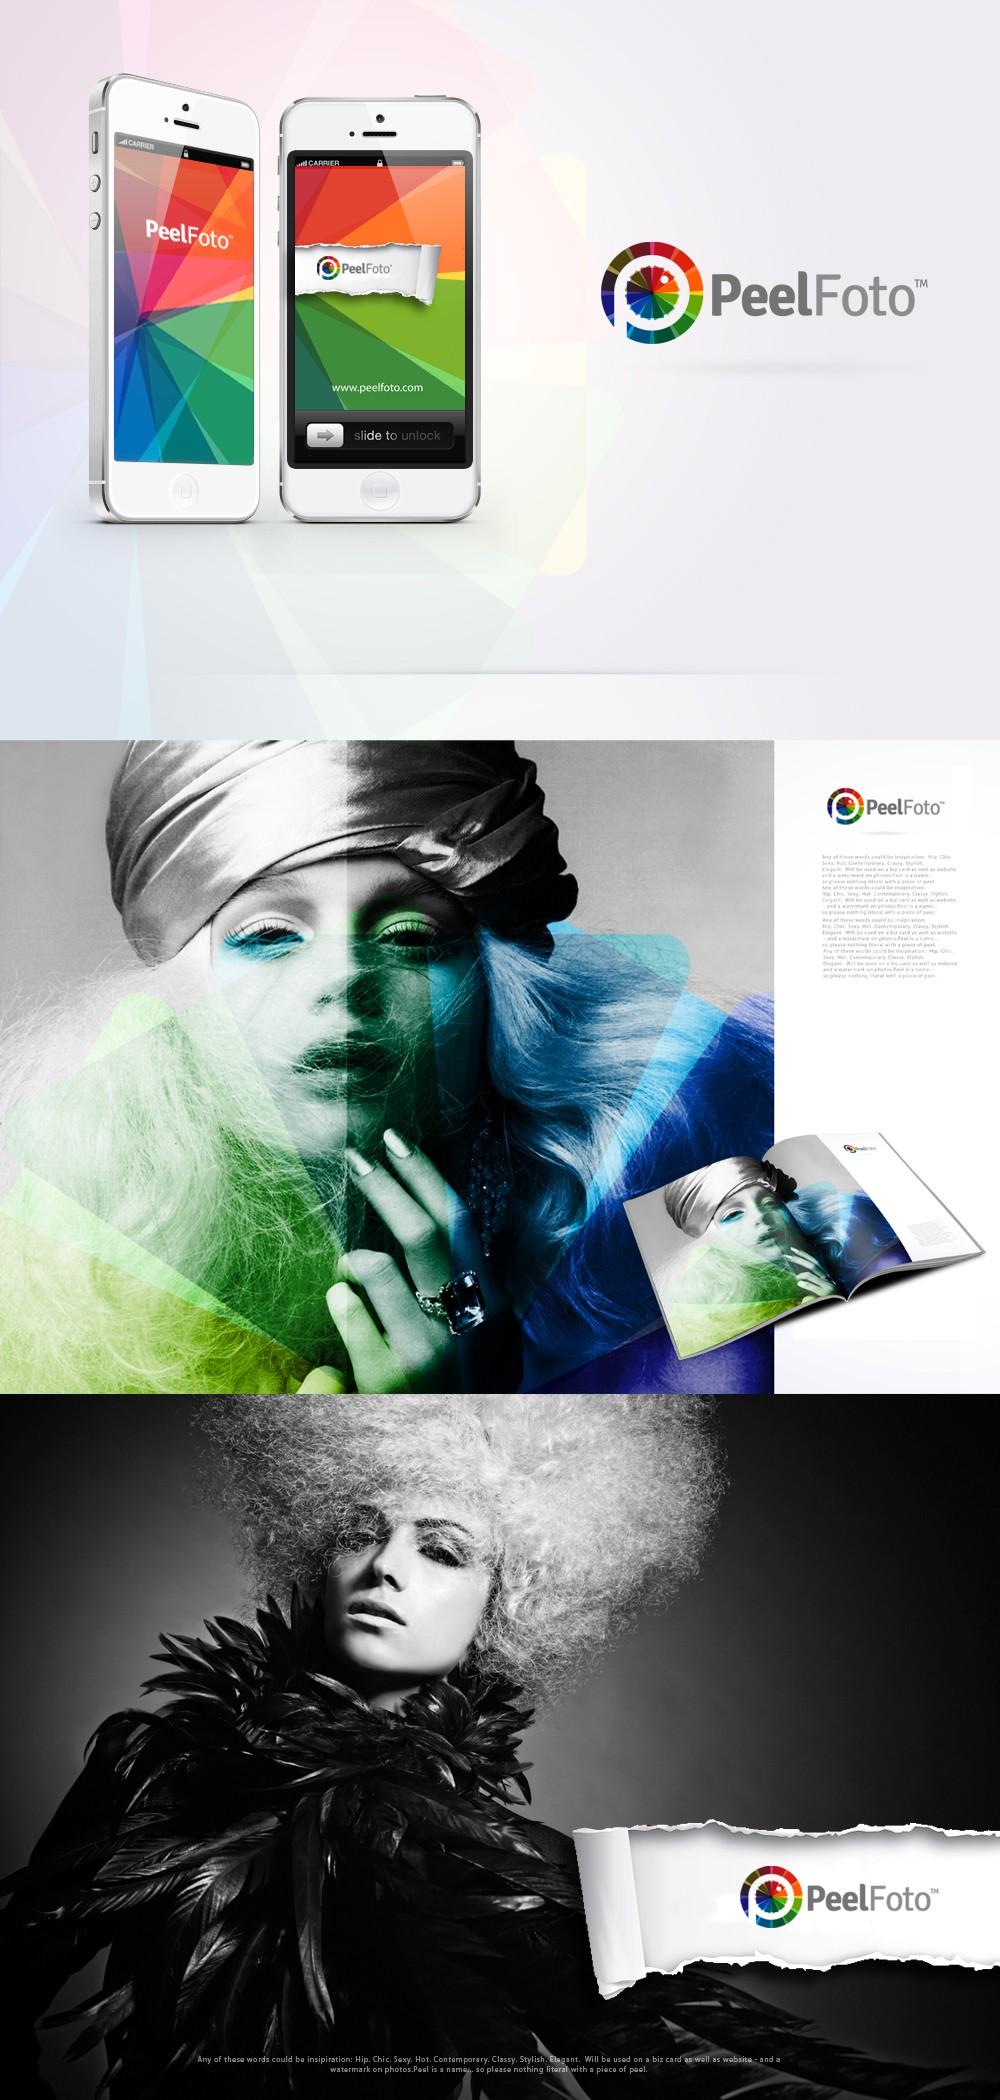 Create the next logo for PeelFoto or Peel Foto